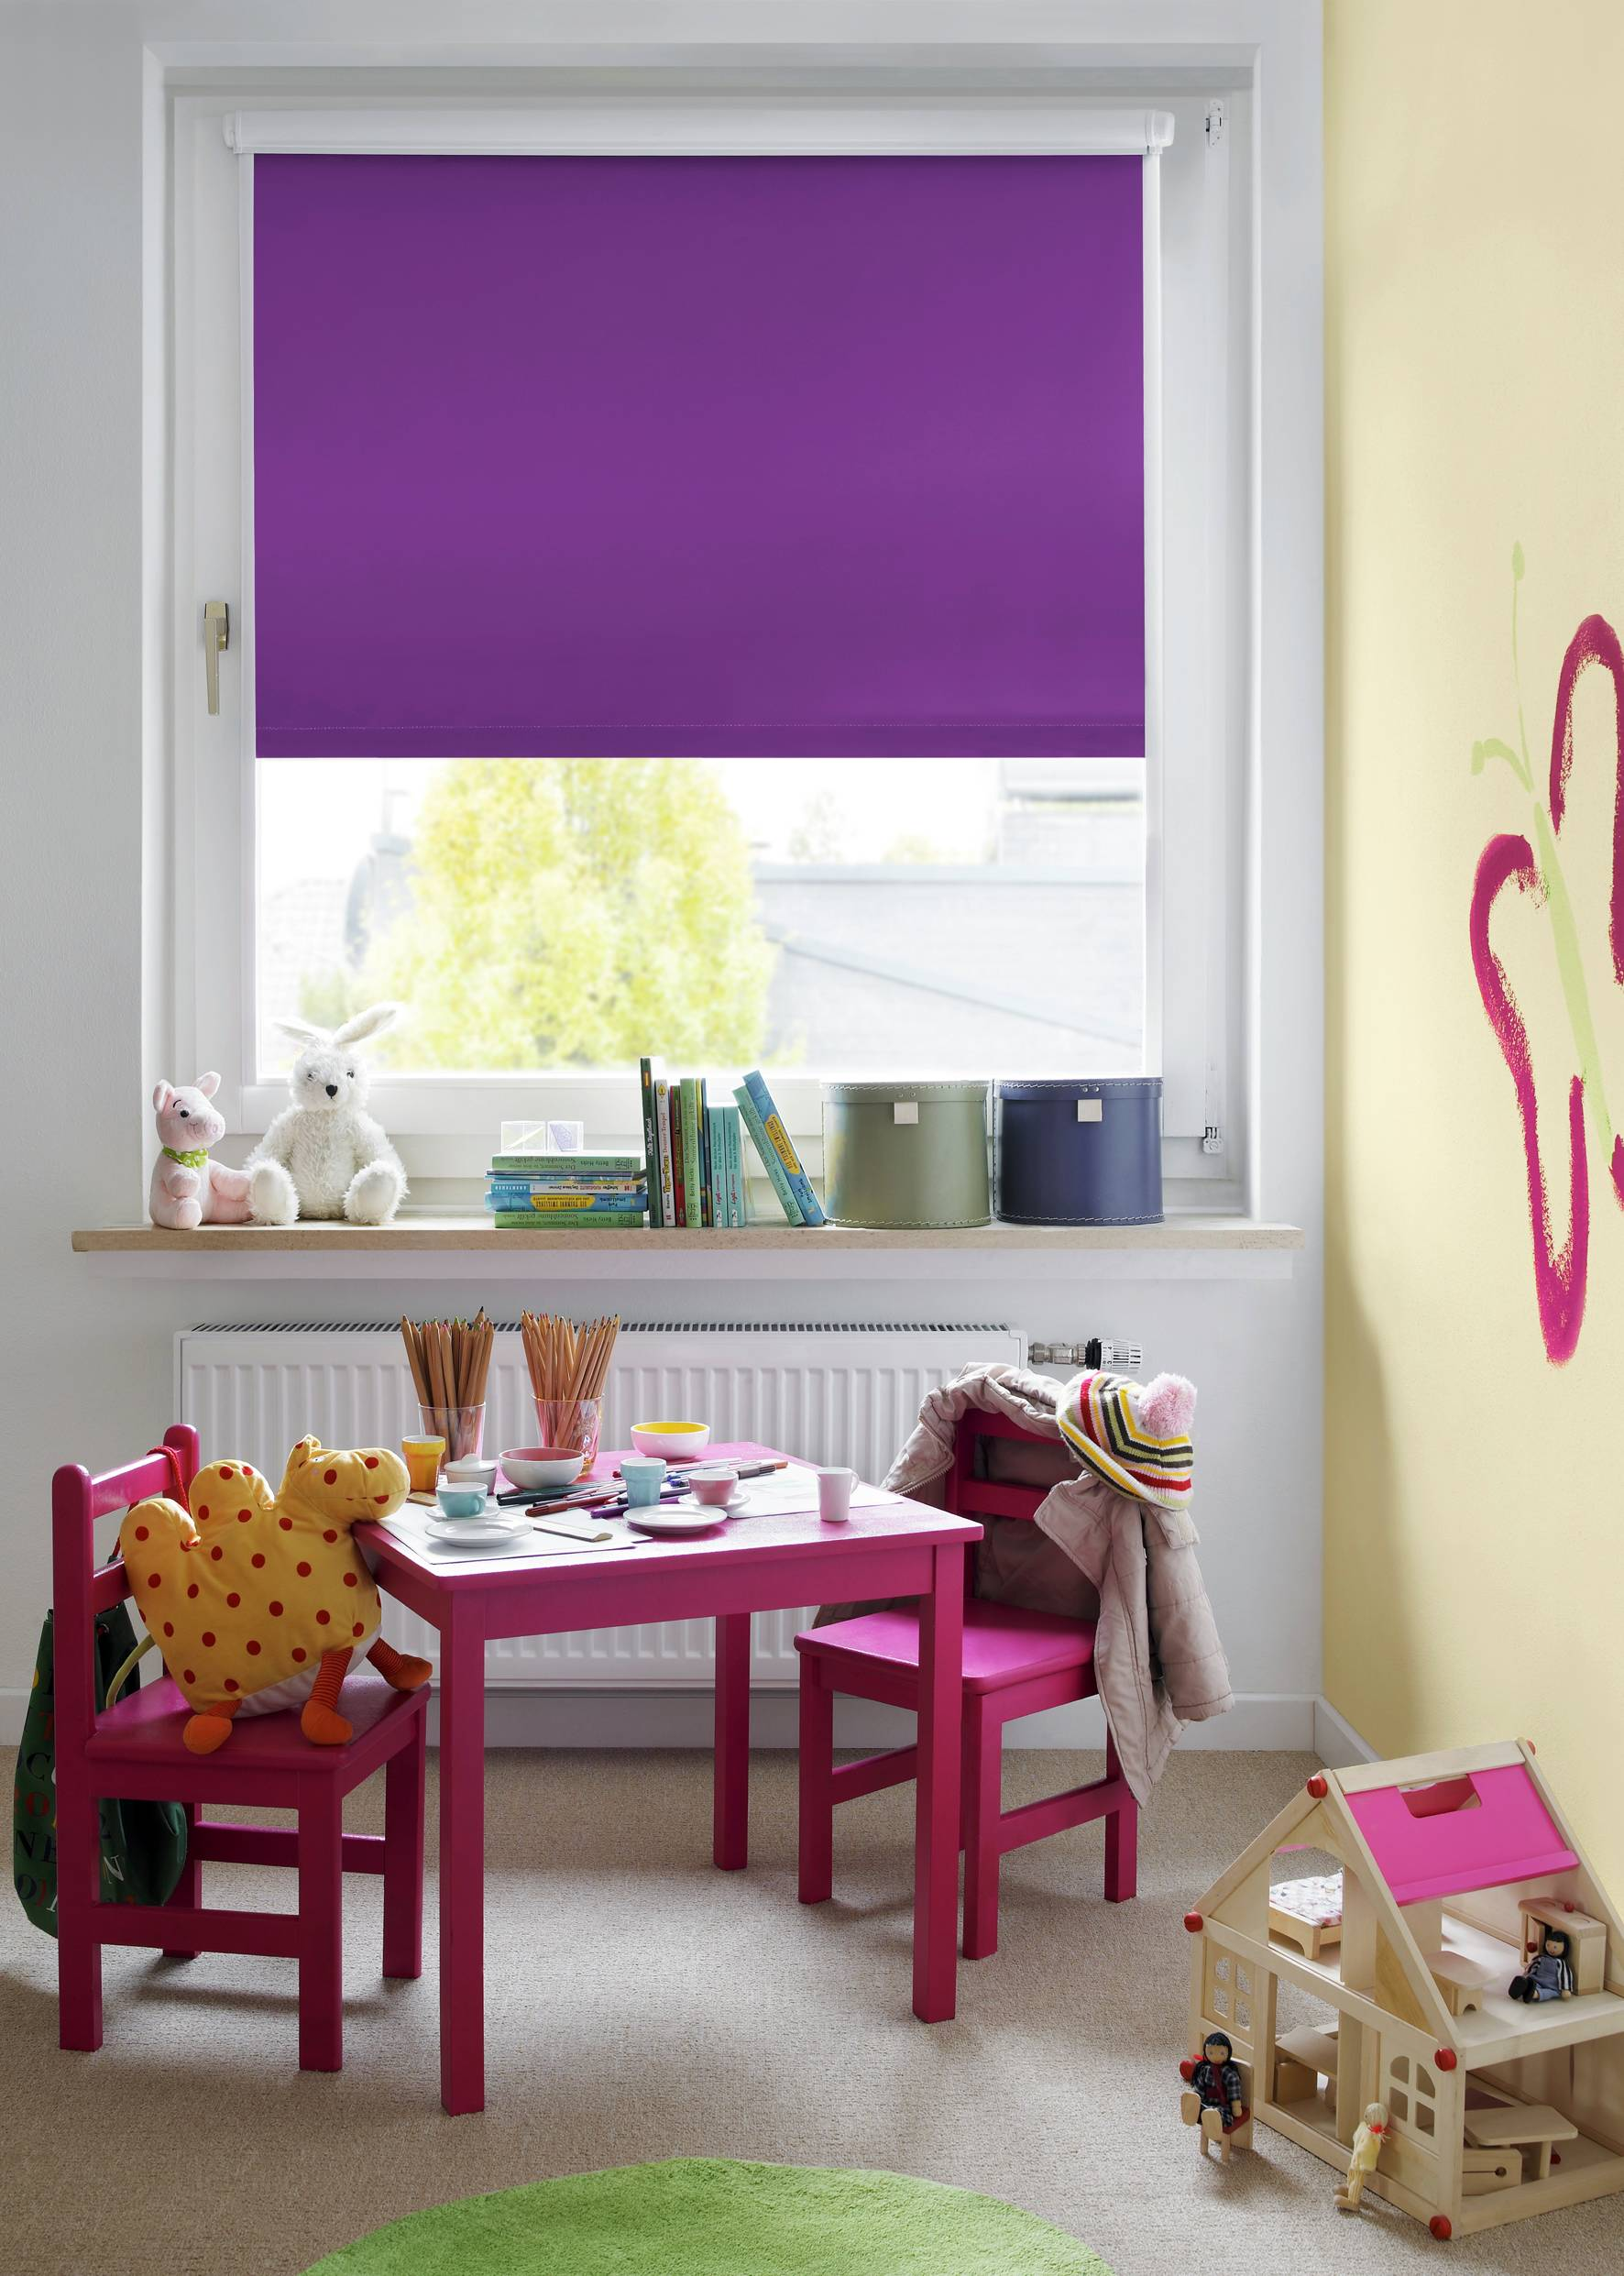 easyfix rollo thermo lila 120 x 150 cm 30743. Black Bedroom Furniture Sets. Home Design Ideas